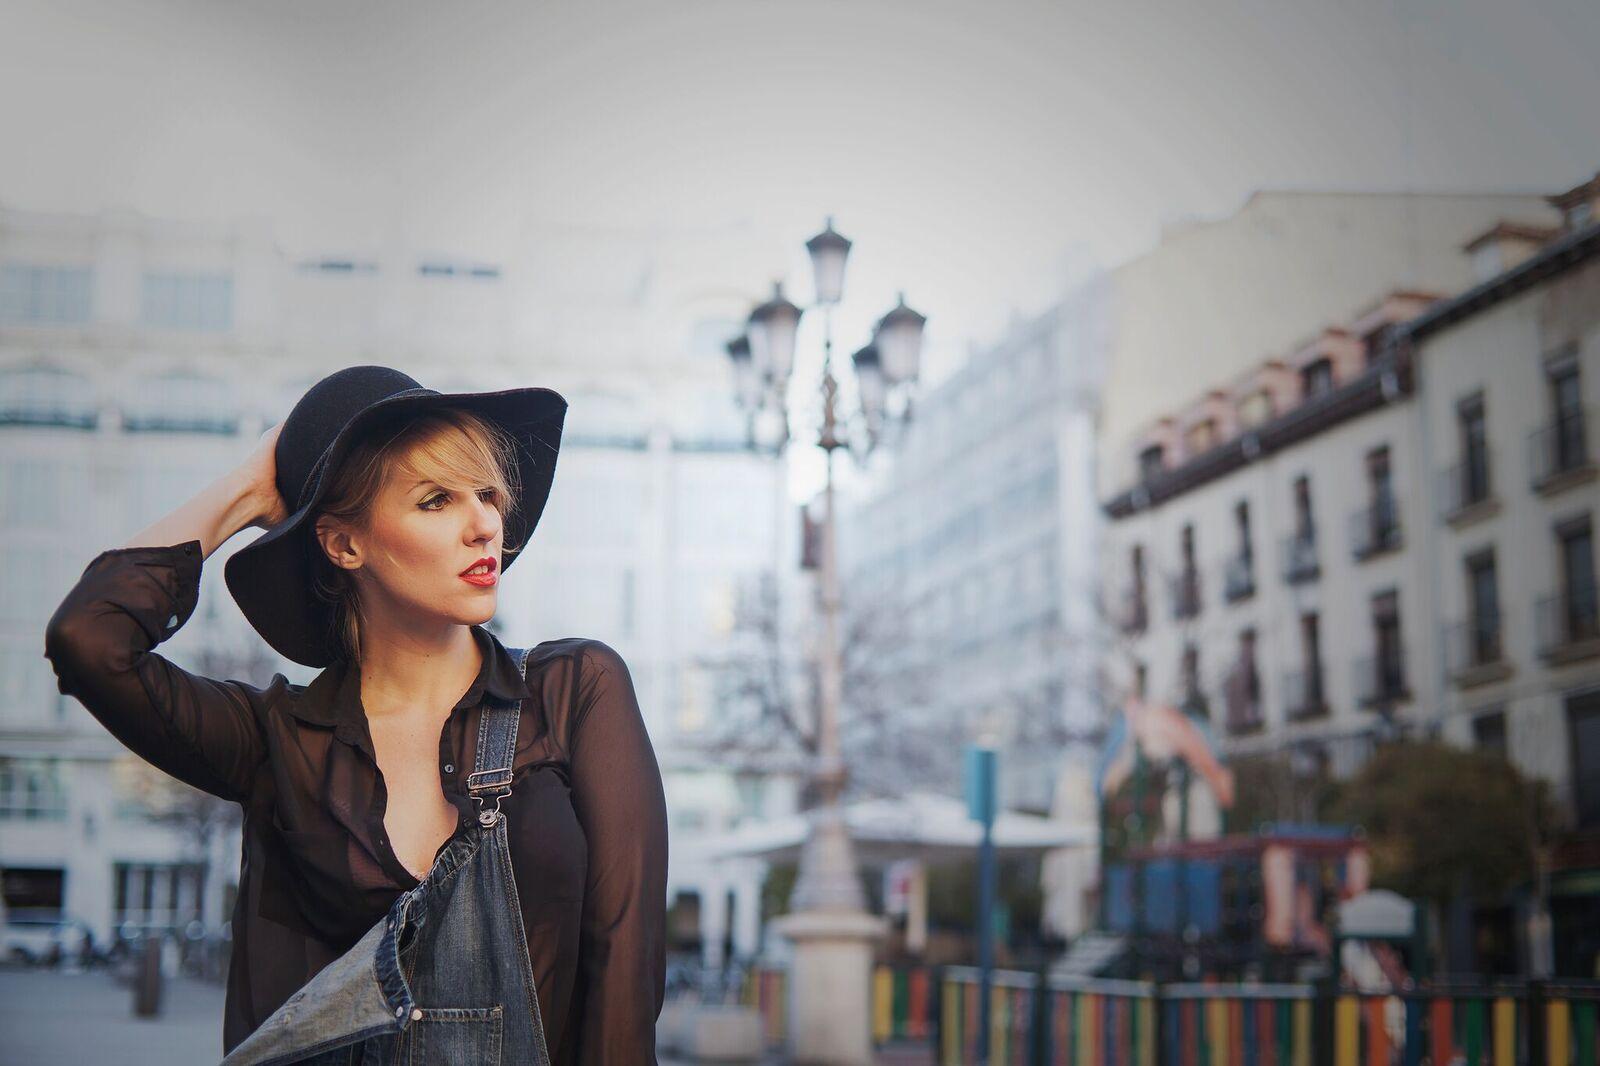 Noa Lur 'Trouble Maker manda un mensaje positivo'